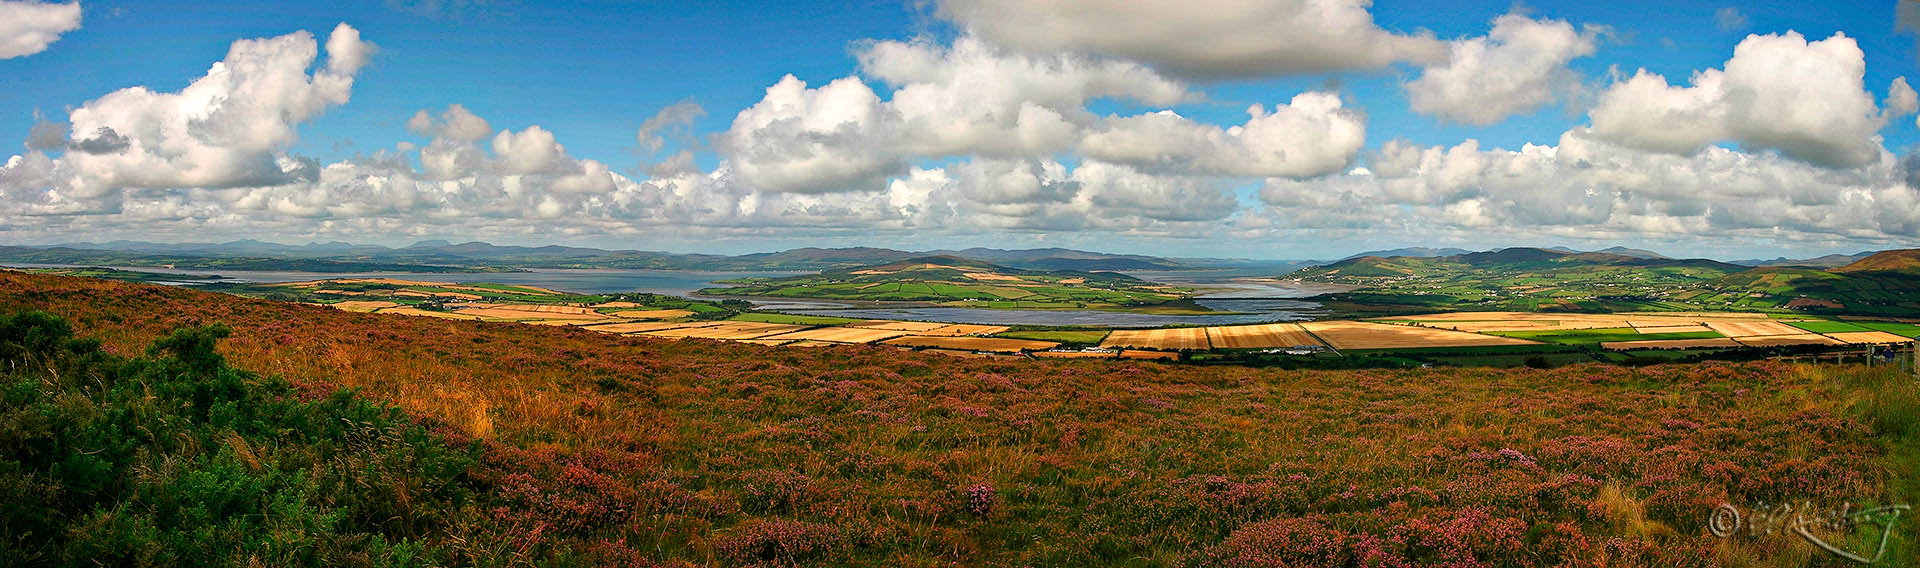 Ireland_Stone_Fort_View